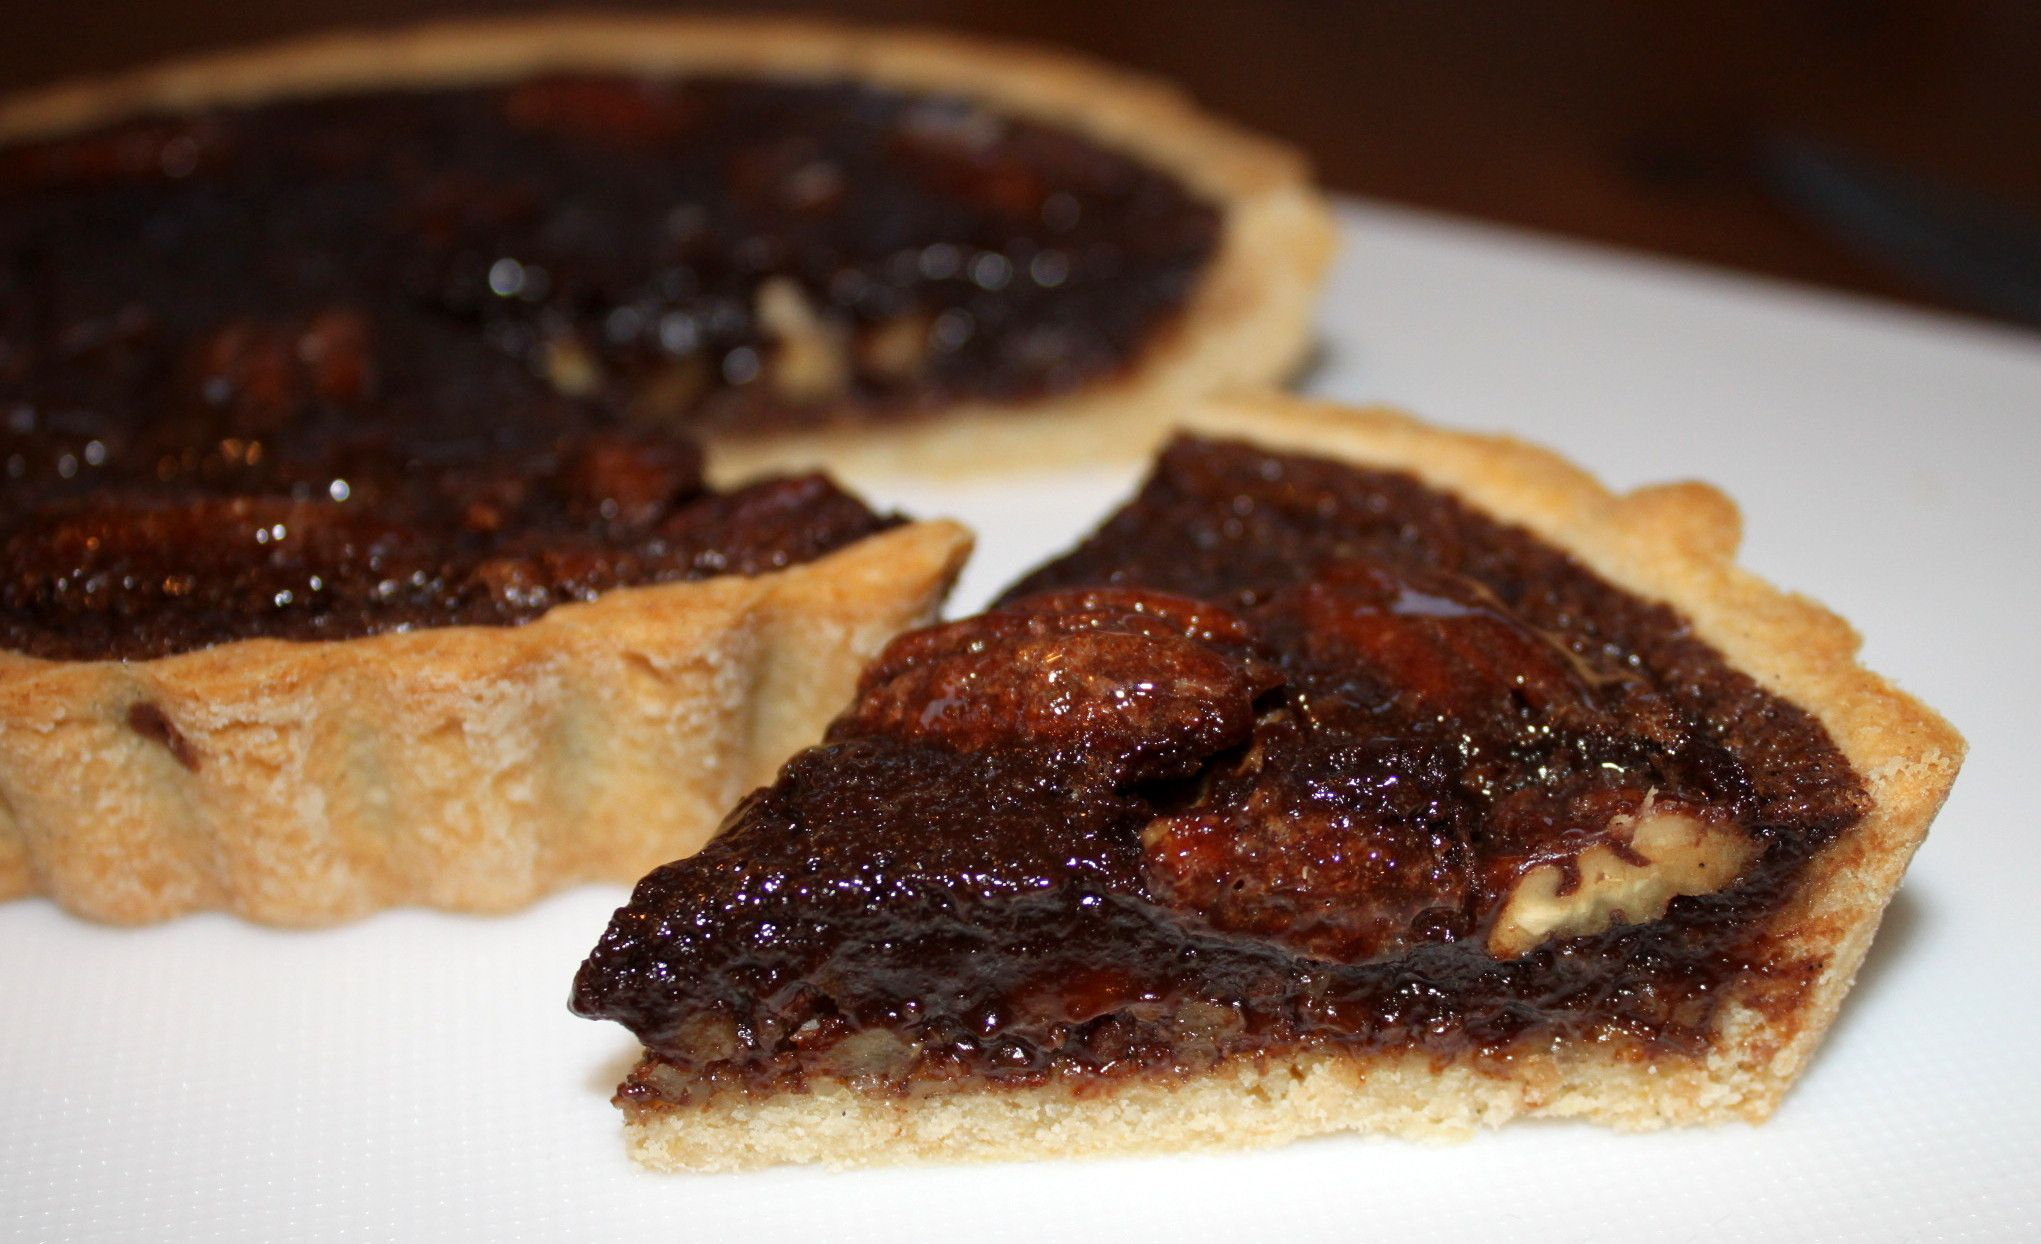 Chocolate Pecan Tart    Volume III - Chocolate Pies and Tarts